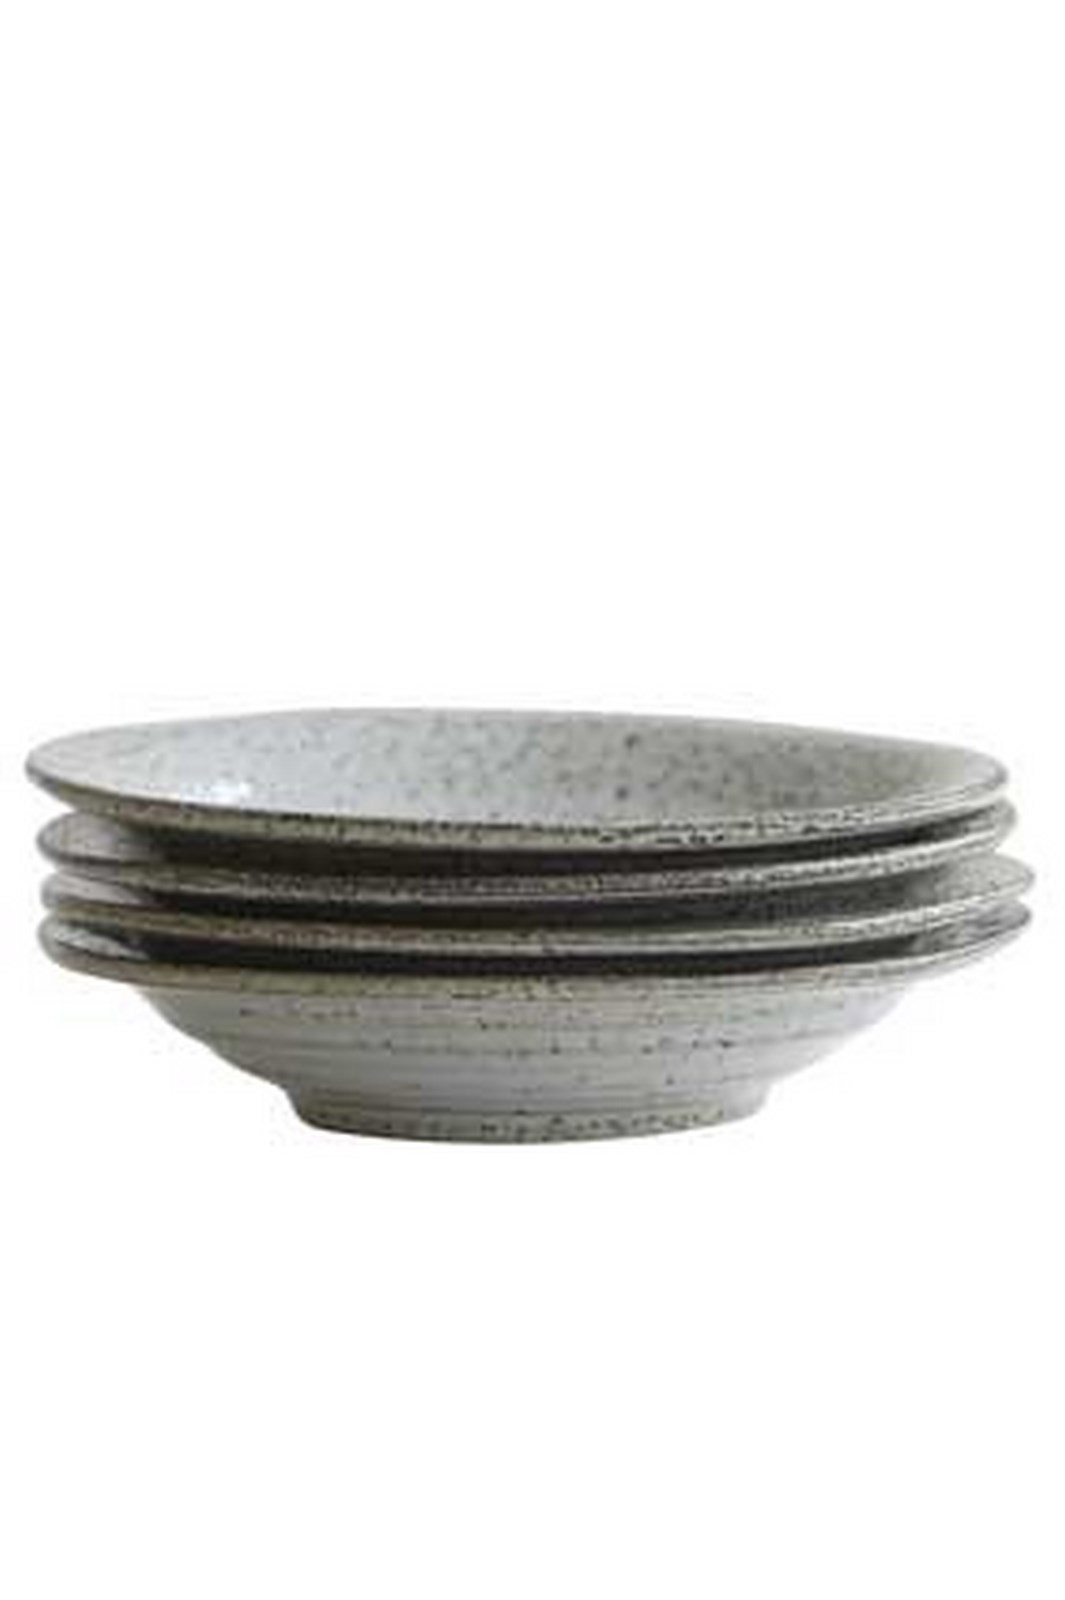 House Doctor Rustic suppetallerken, 25 cm, gråblå